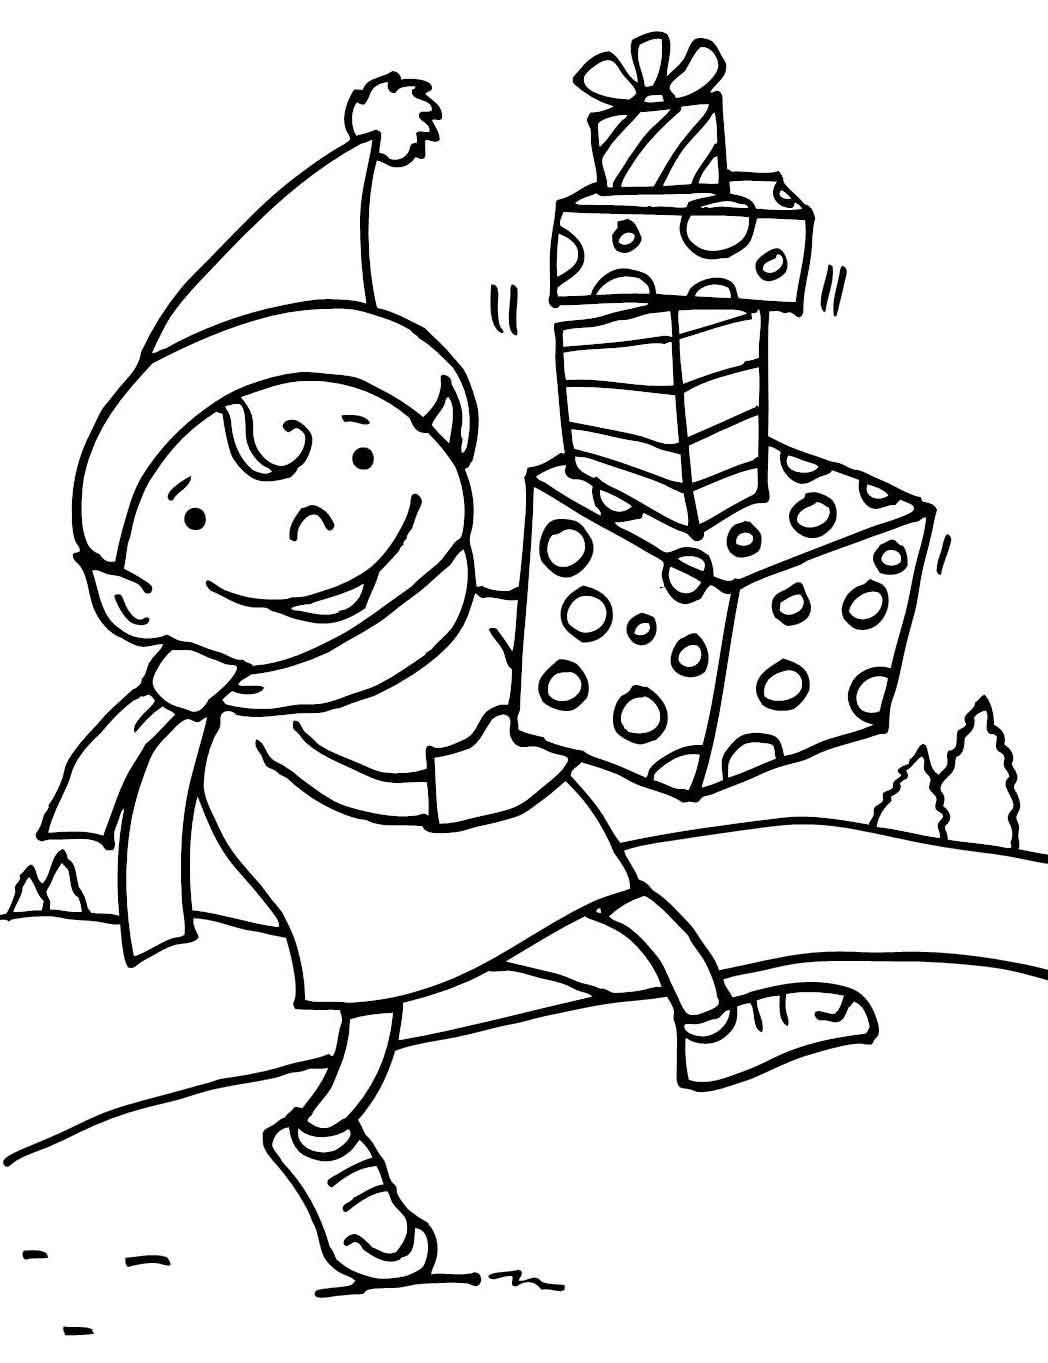 Christmas Elf Coloring Pages Printable At Getdrawings